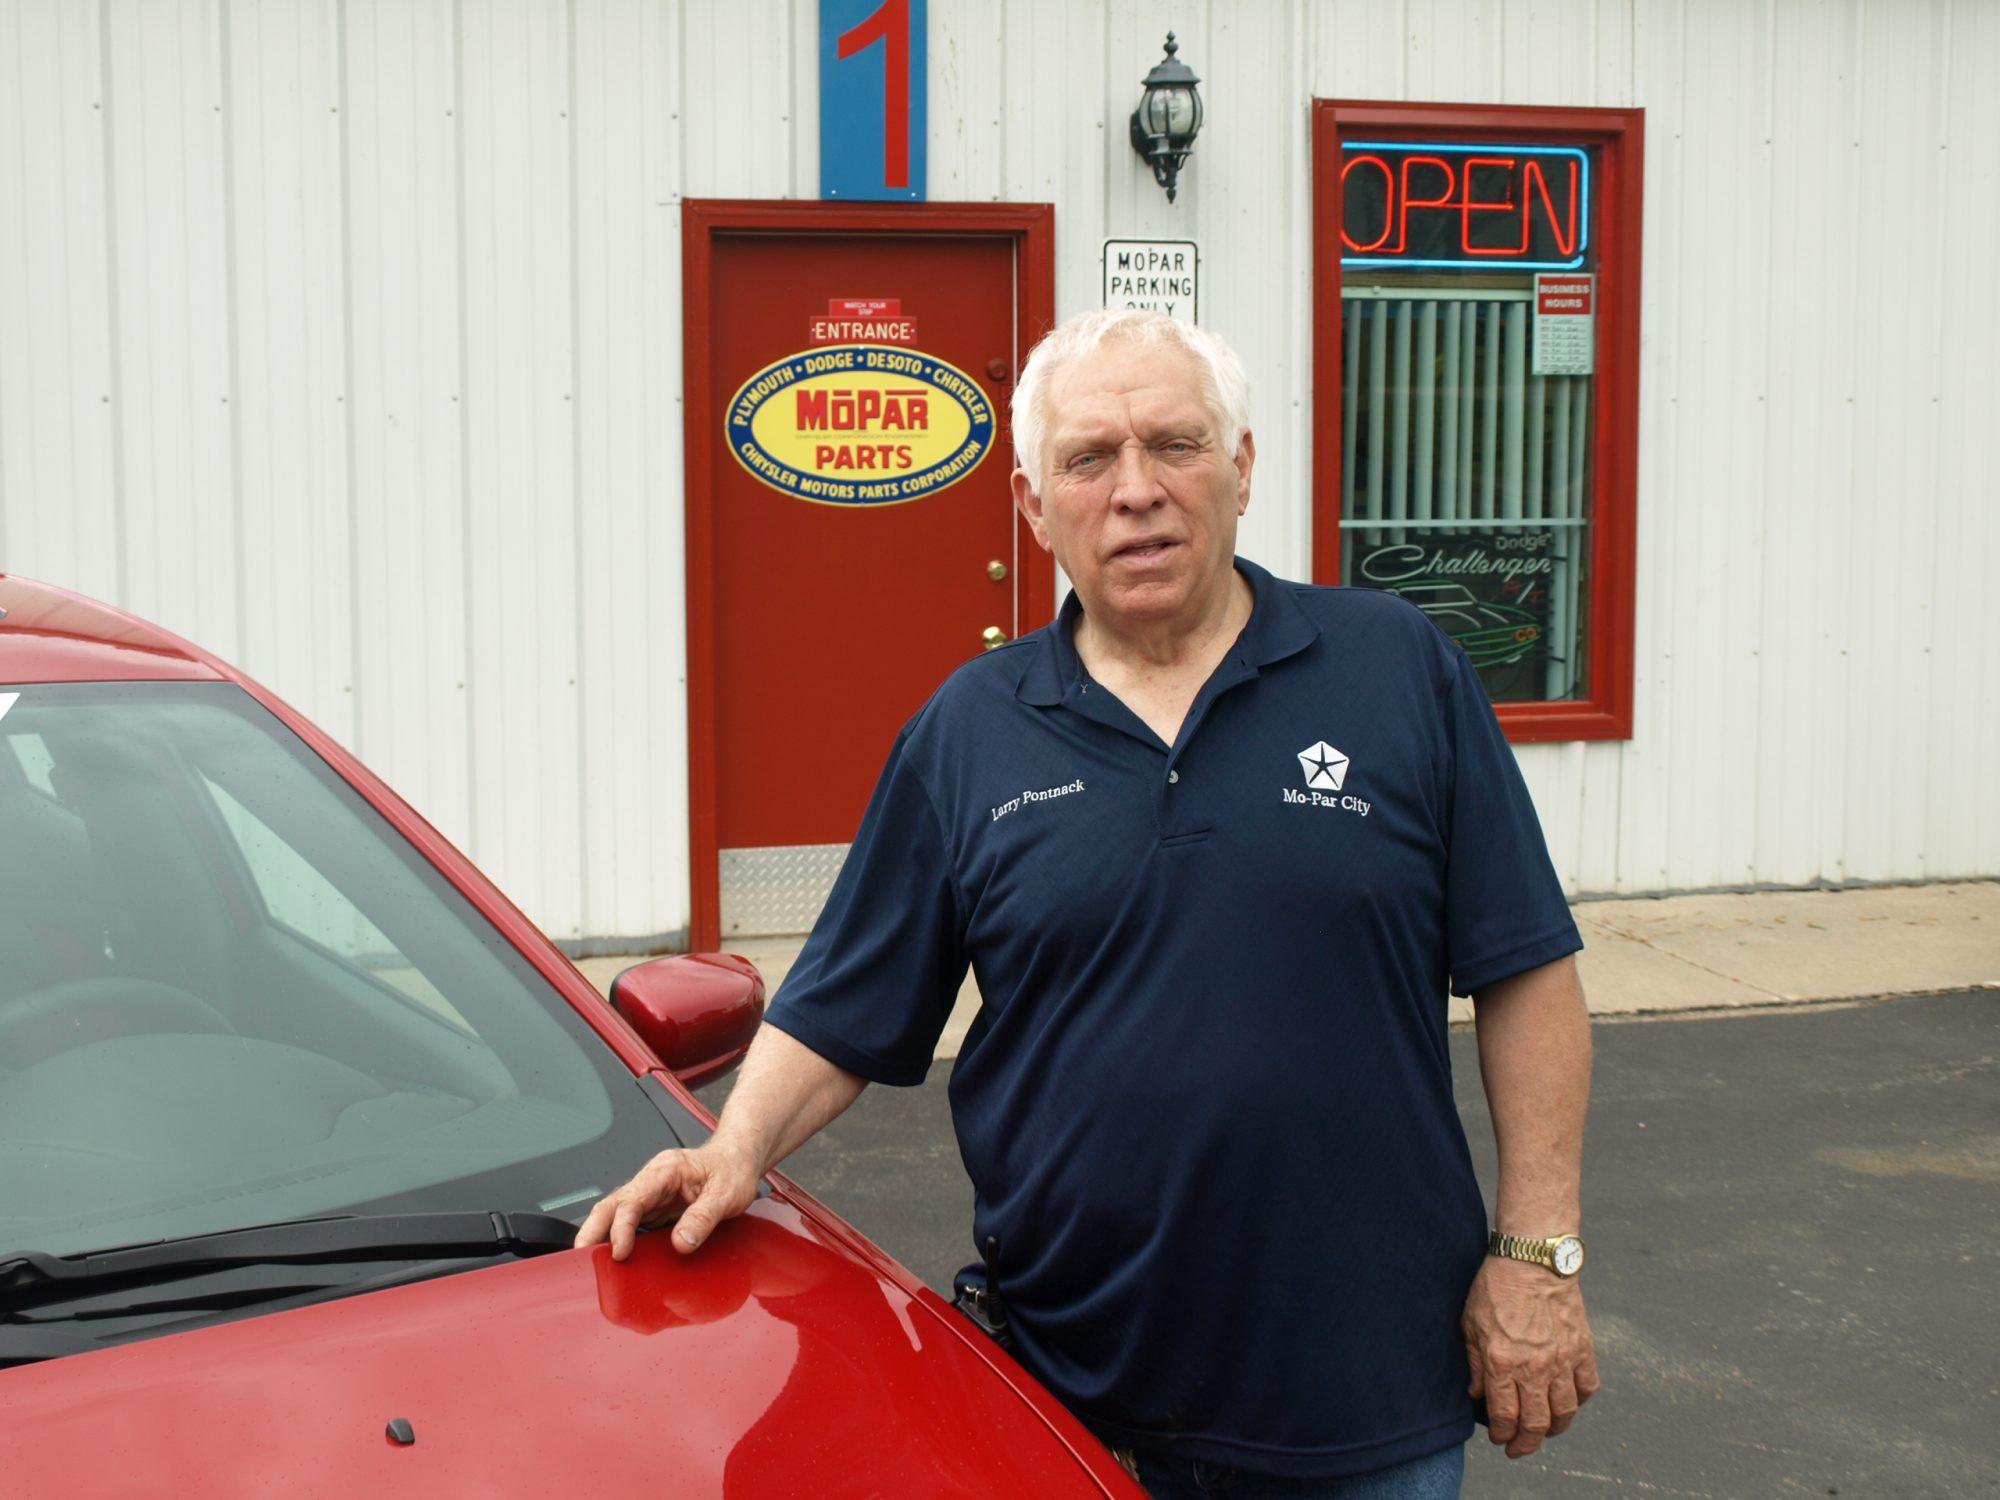 Larry Pontnack standing outside of his Mopar business